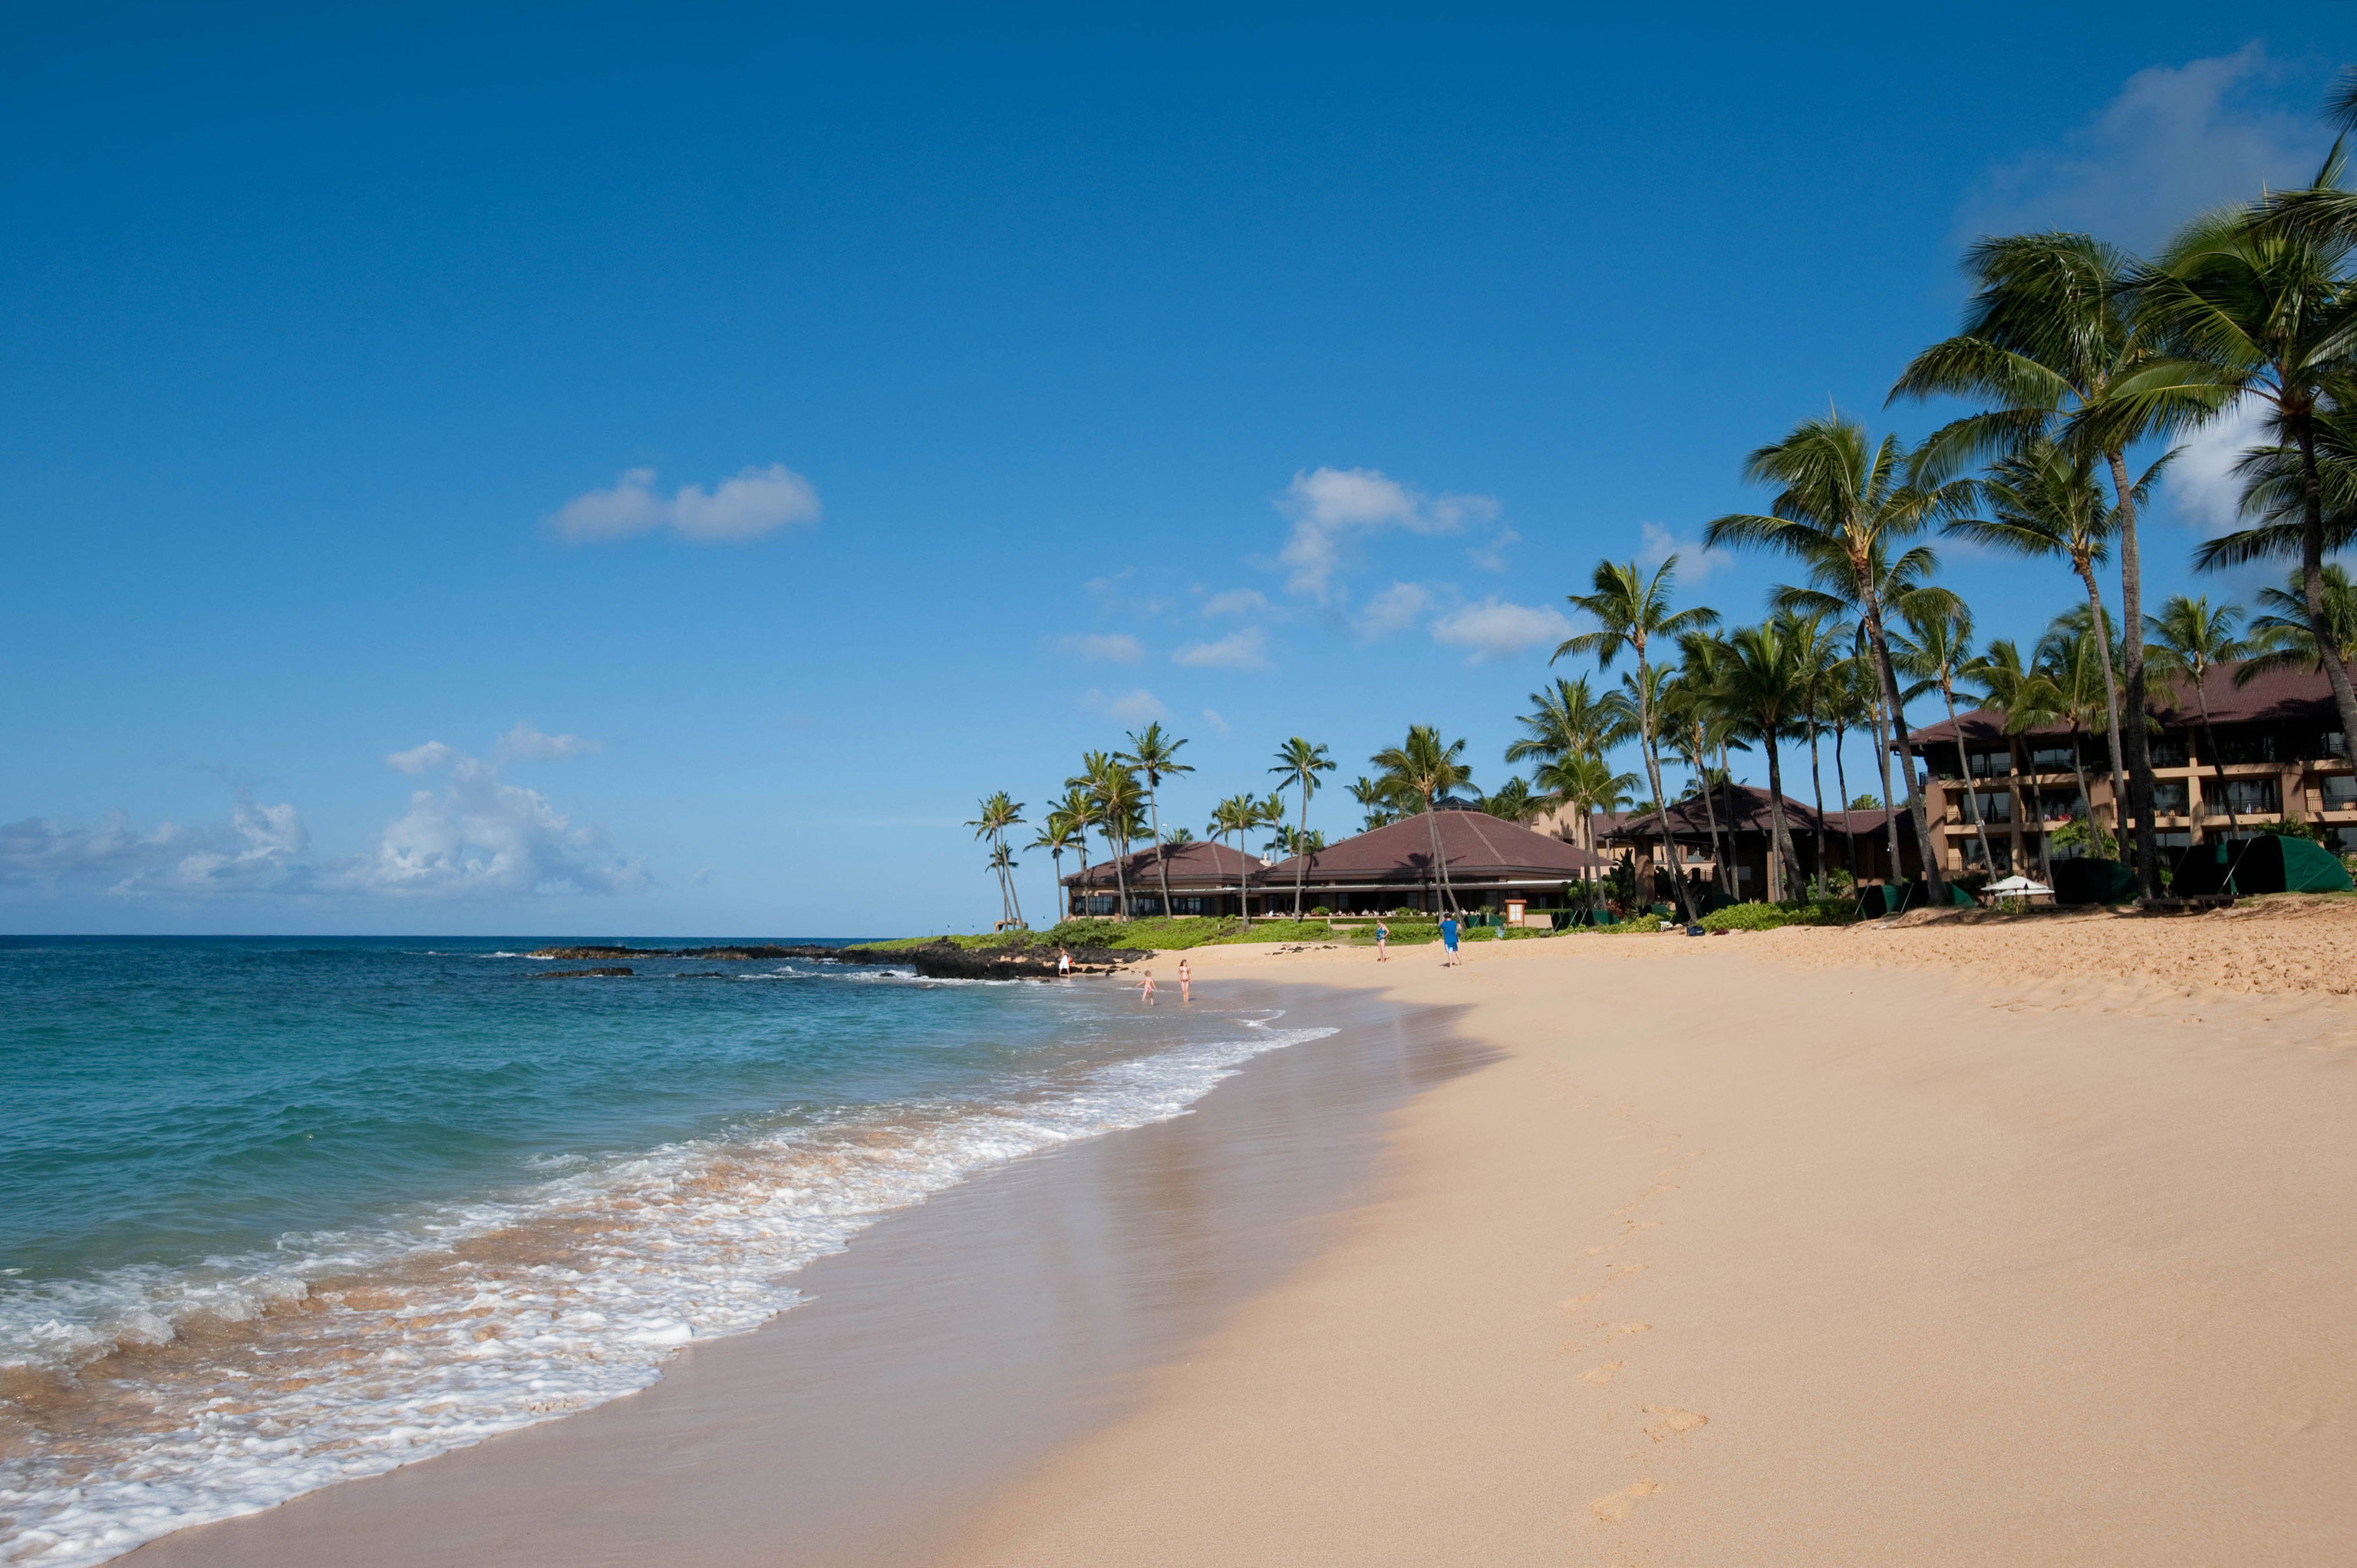 sky Beach water shore Sea Nature Ocean Coast horizon caribbean tropics sand cape walkway sandy